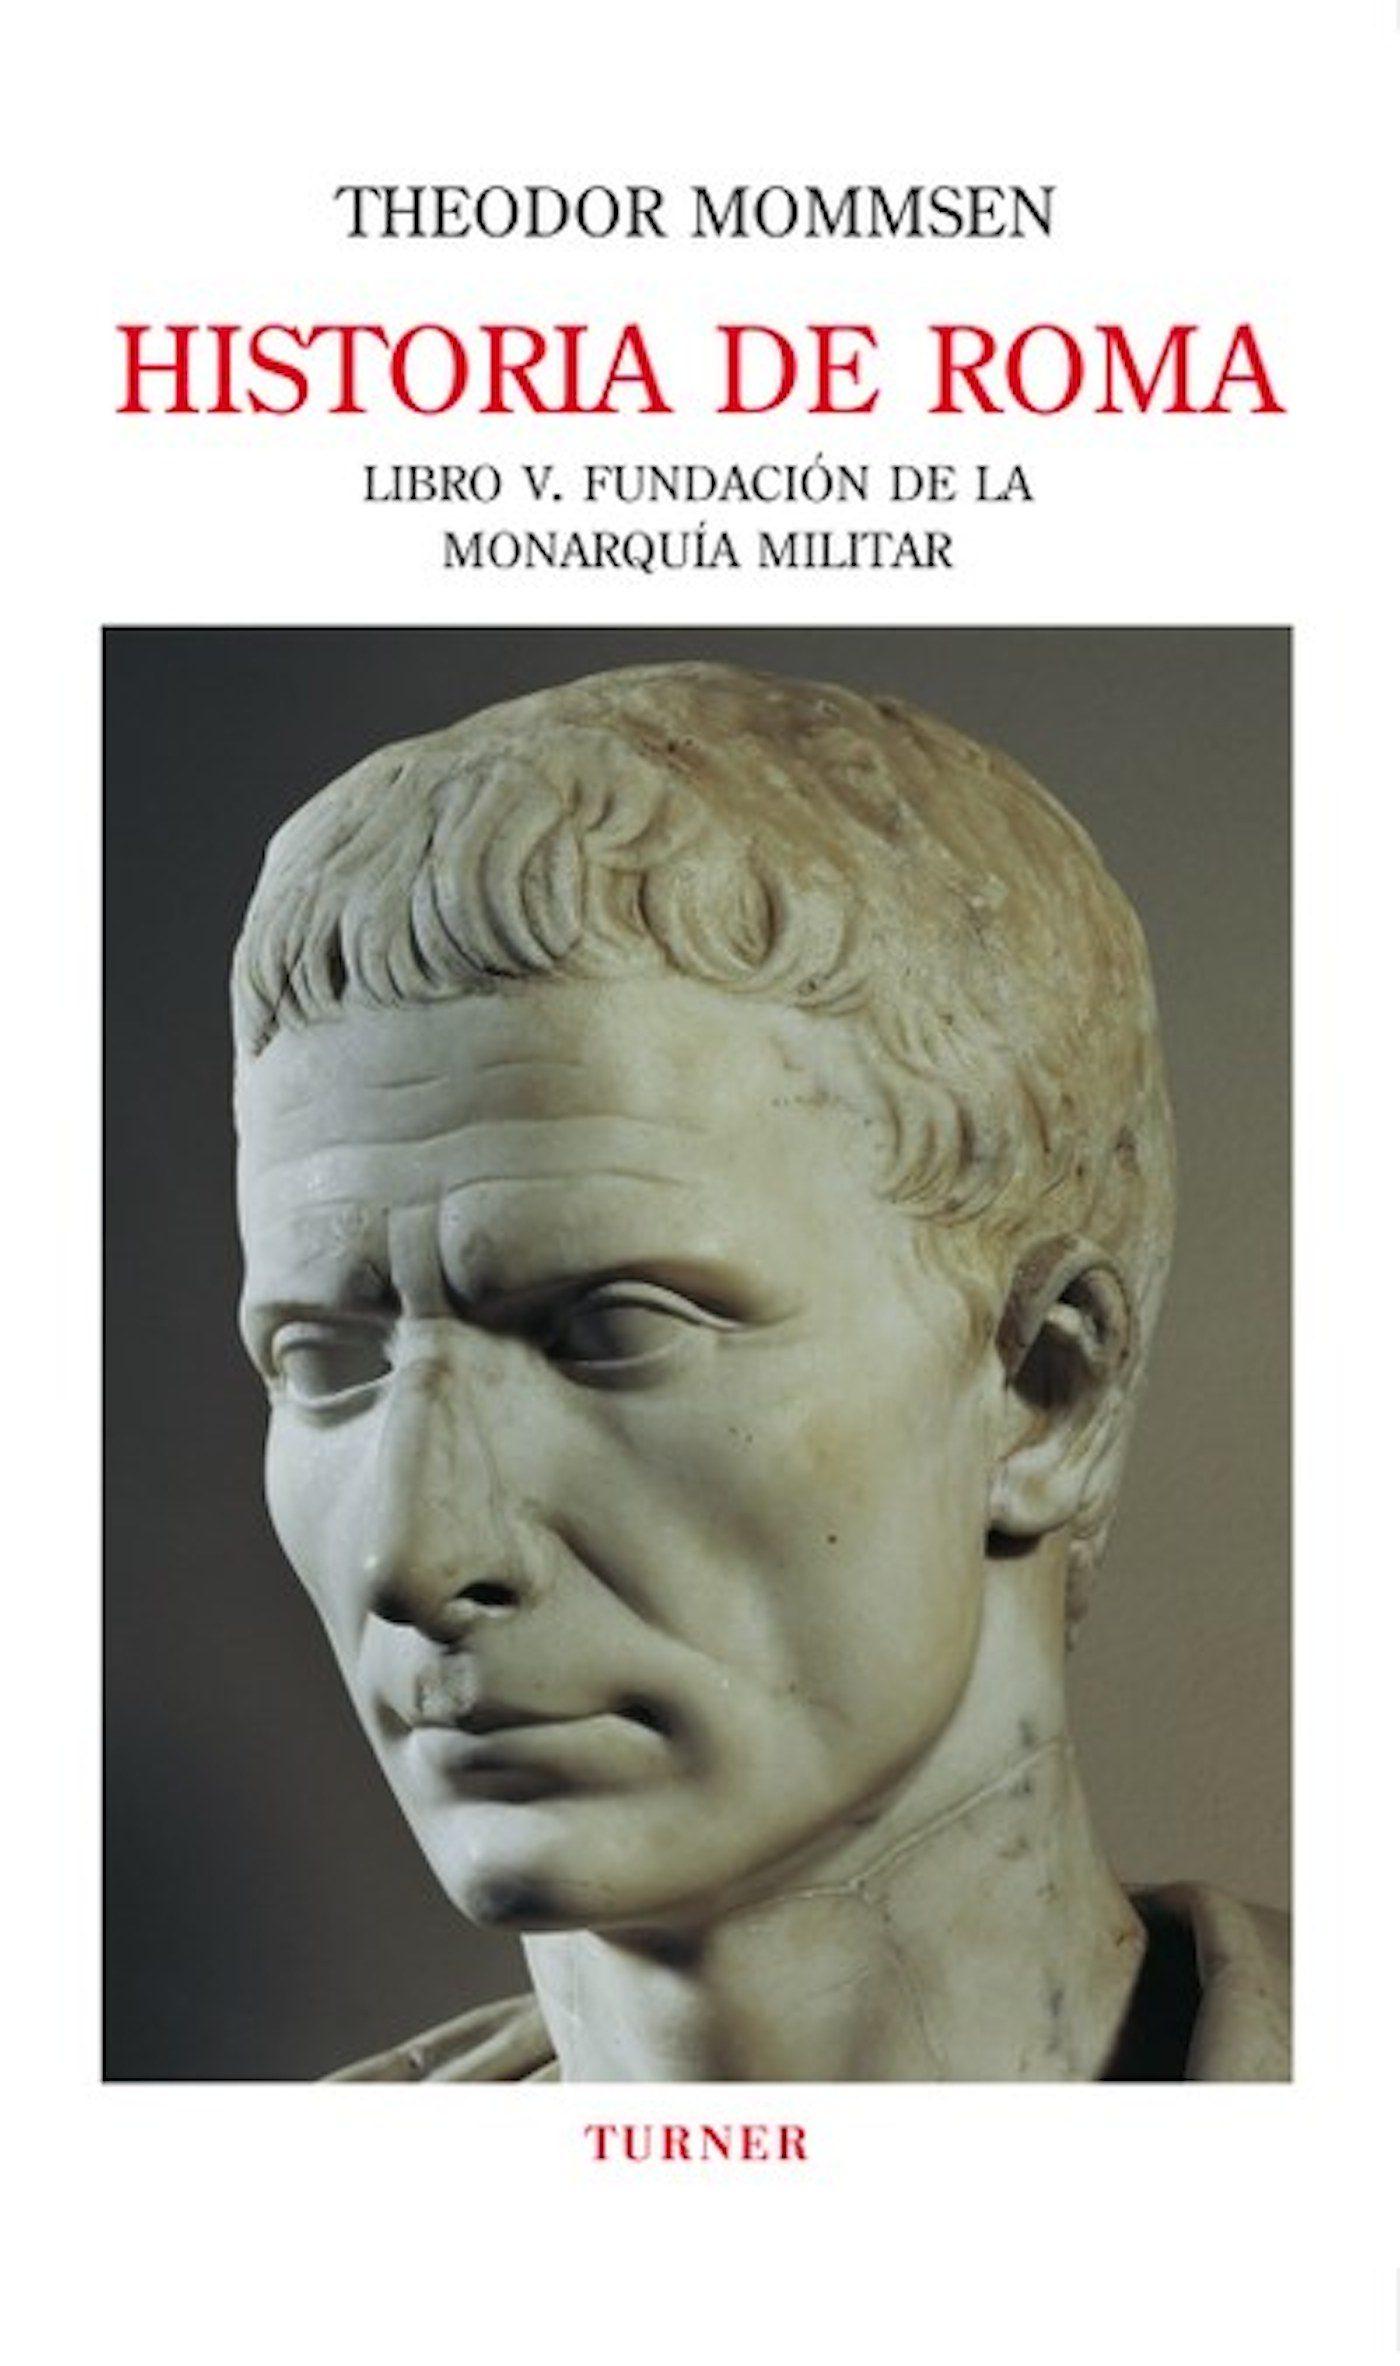 Historia De Roma. Libro V   por Theodor Mommsen epub